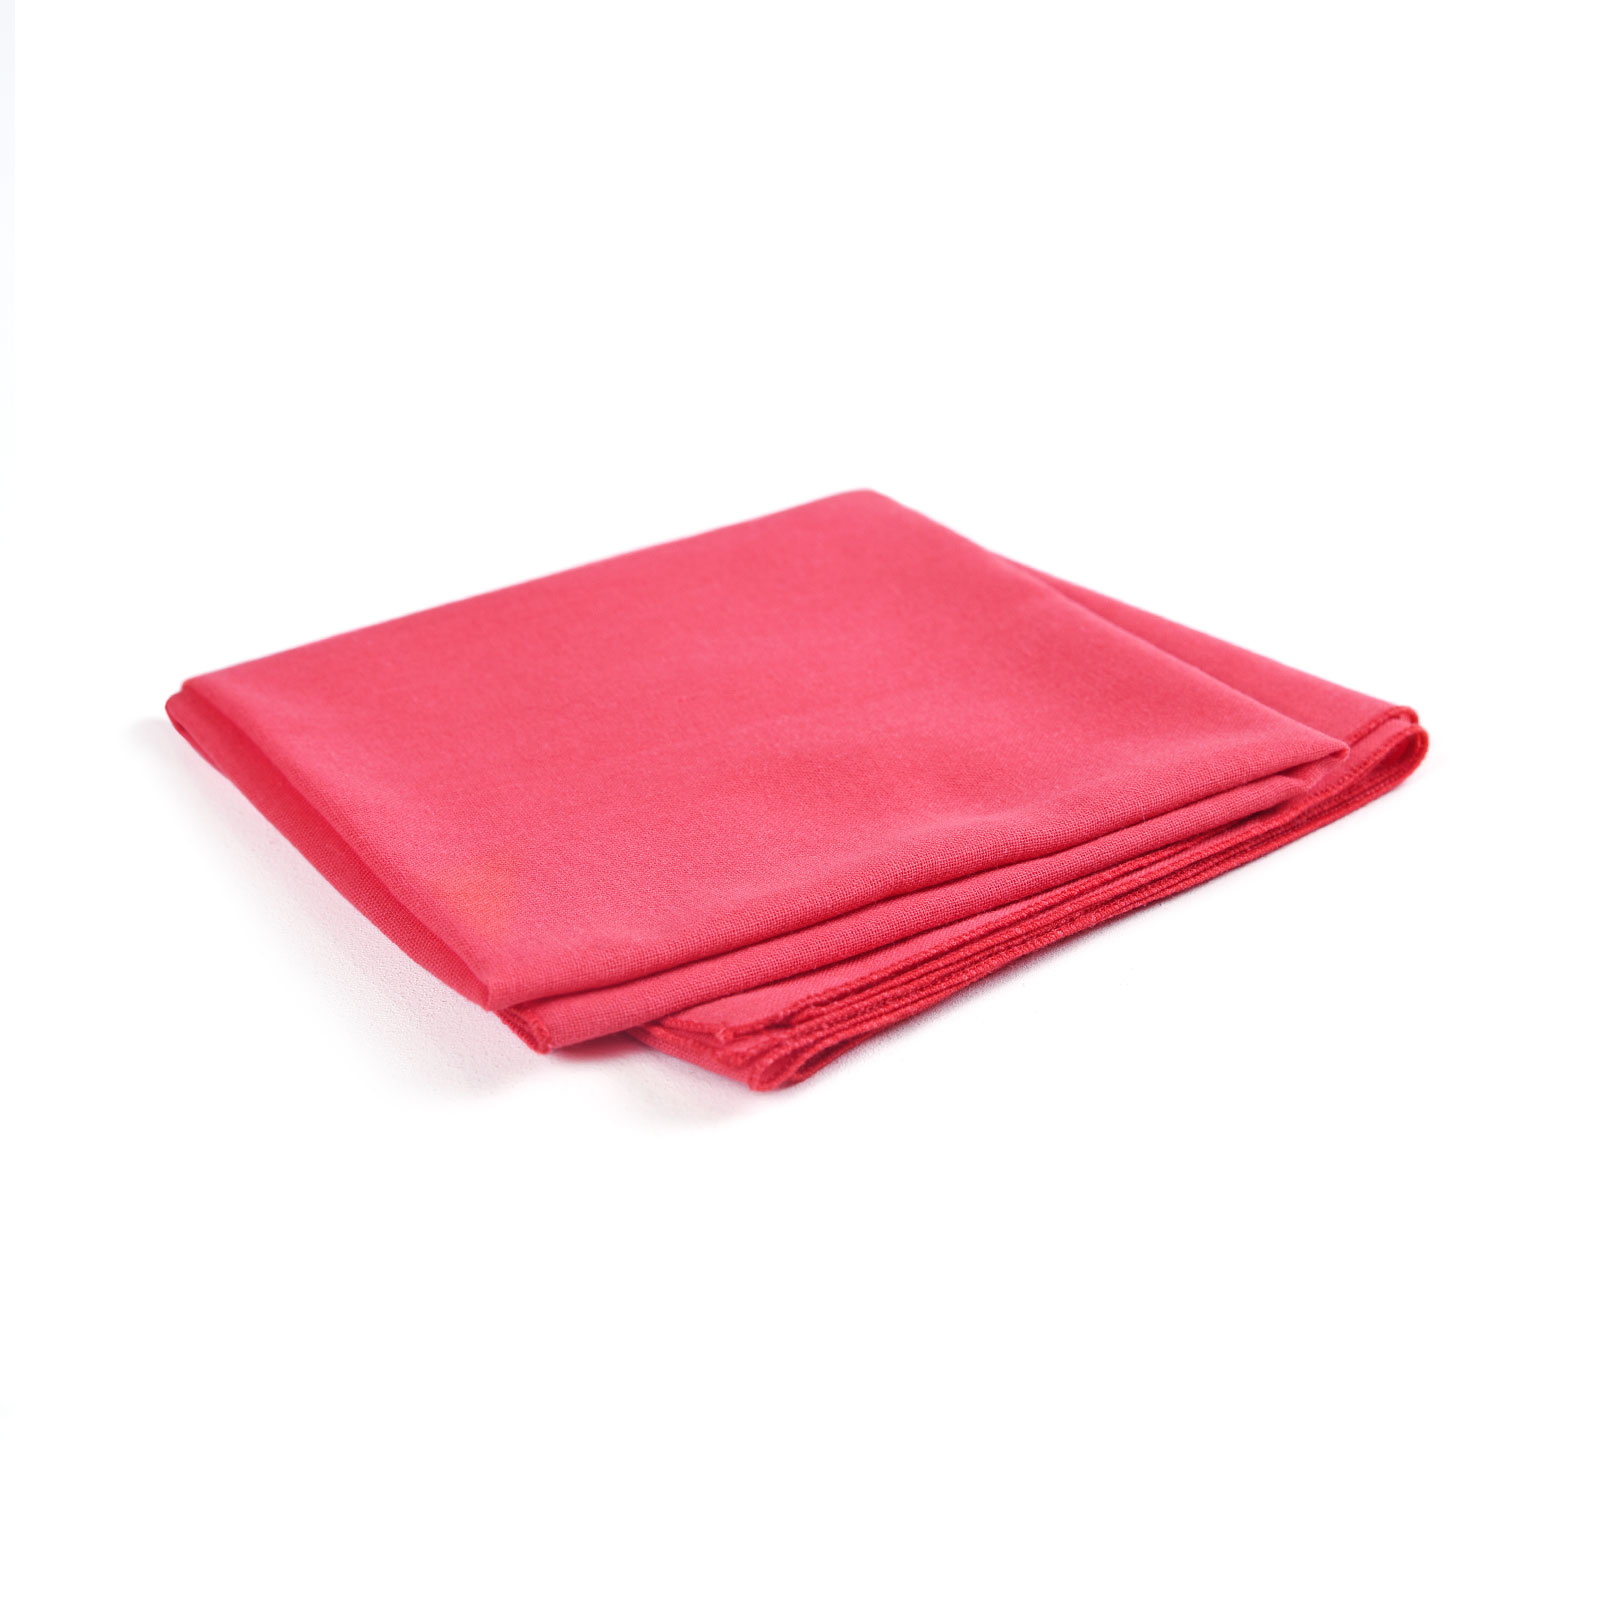 AT-04305-F16-P-bandana-rouge